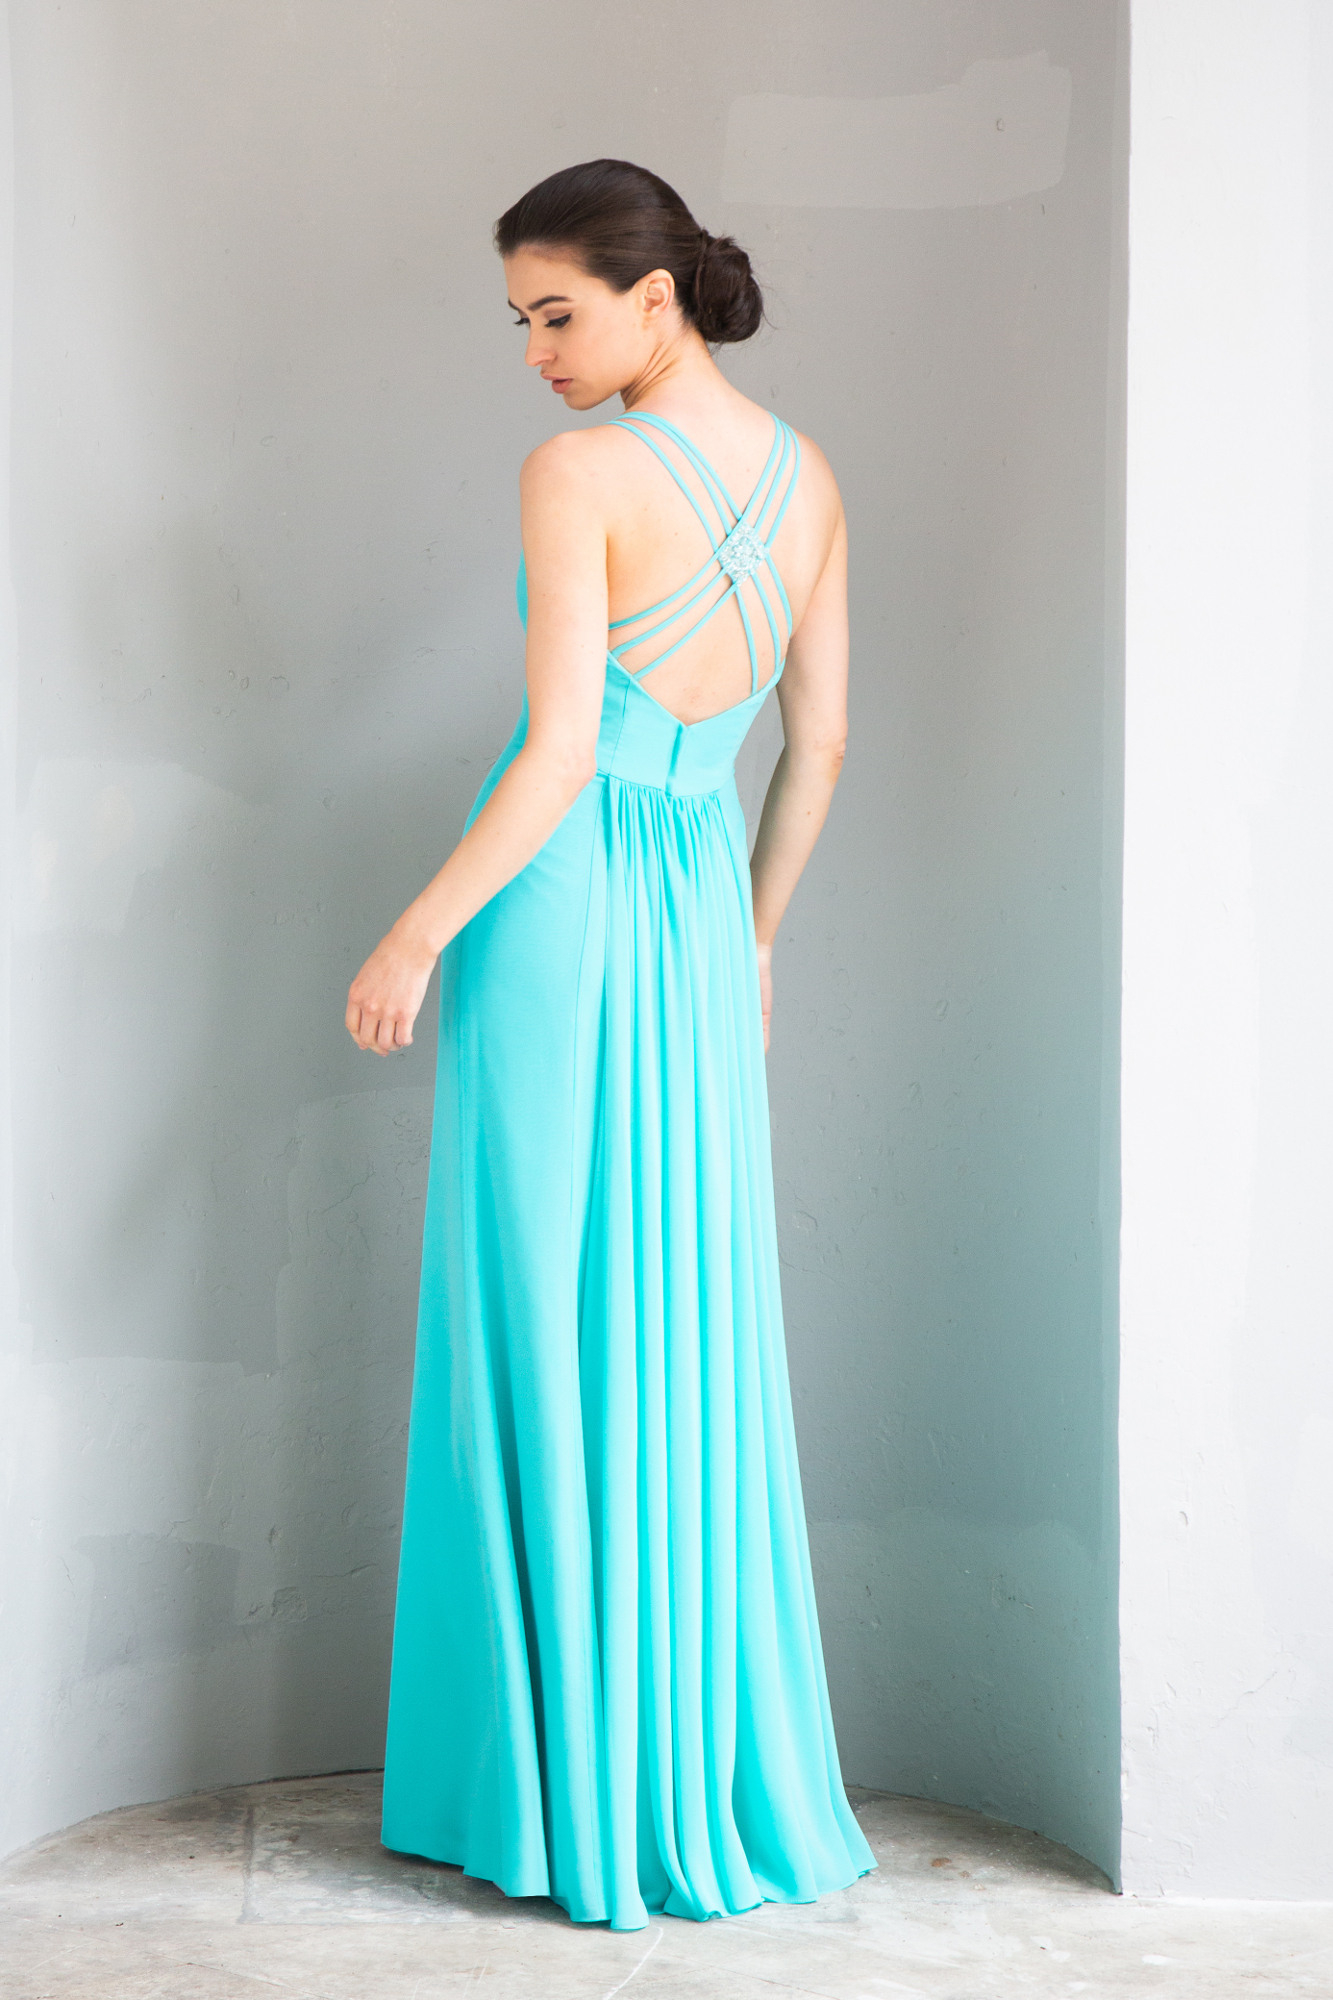 Schön Türkises Langes Kleid Bester PreisAbend Genial Türkises Langes Kleid Spezialgebiet